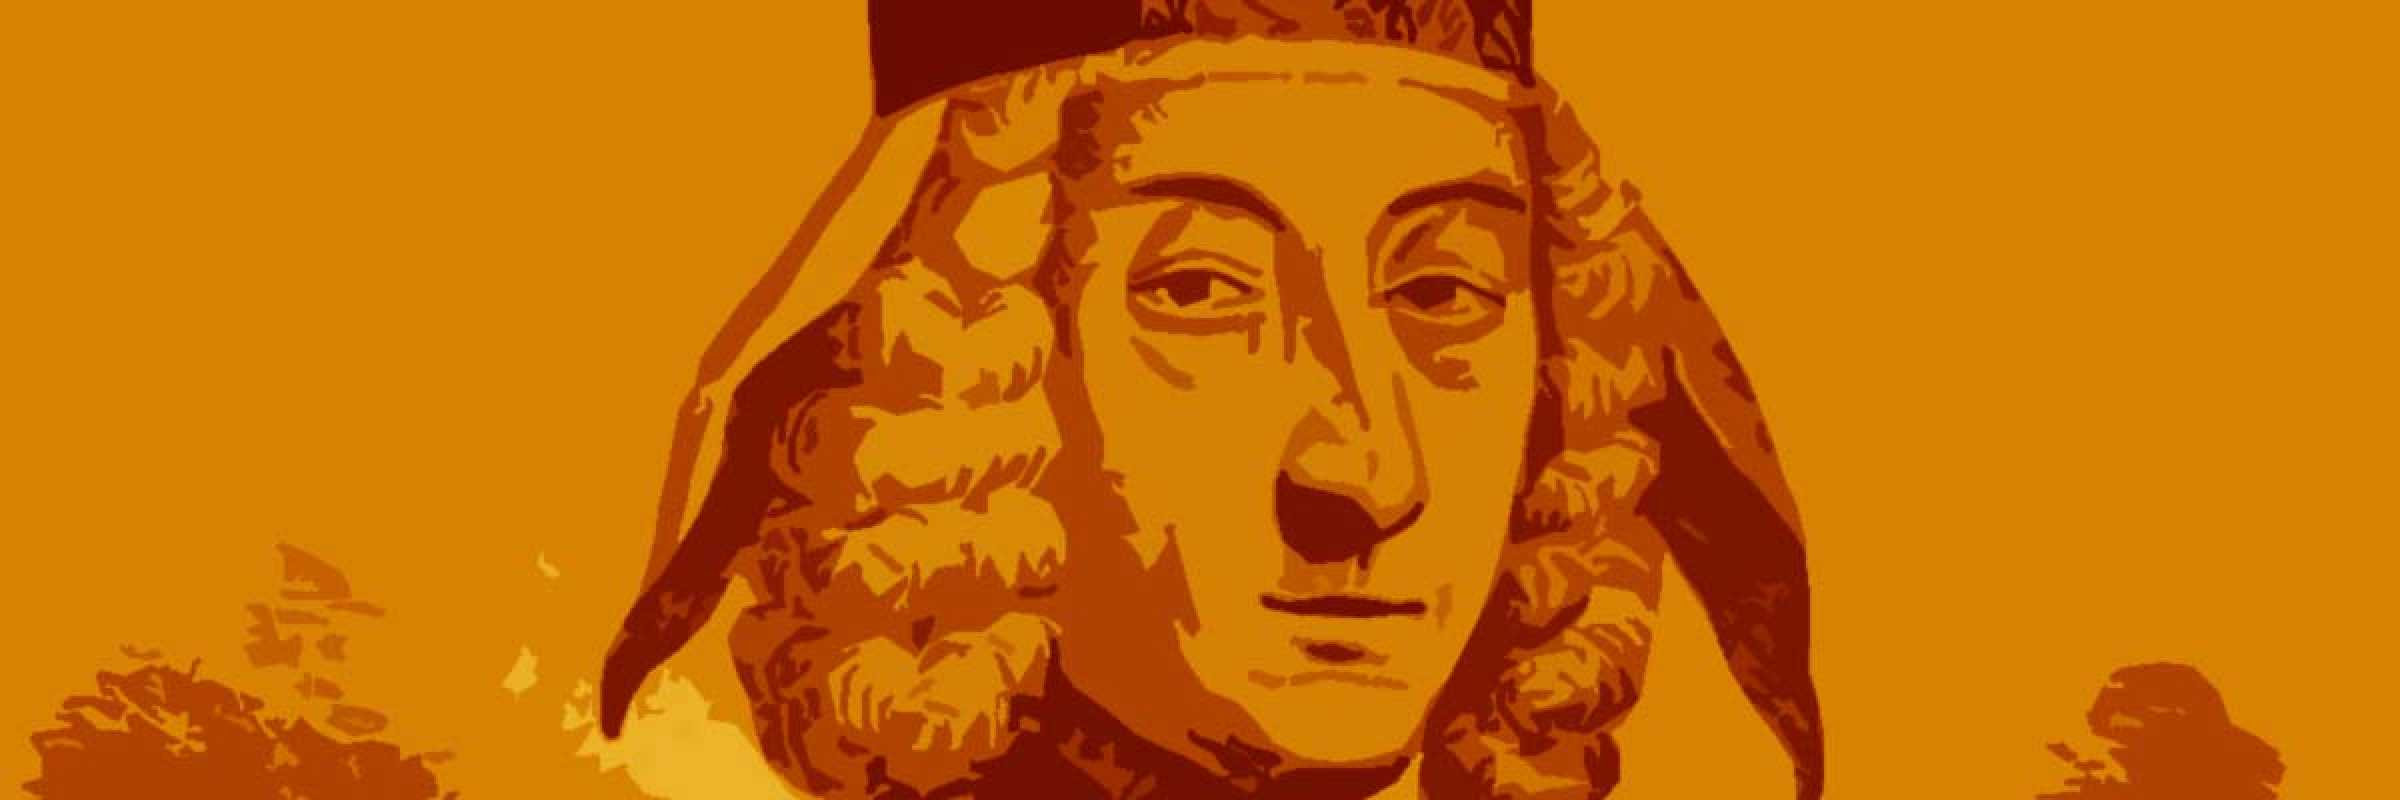 incisione raffigurante il doge Francesco Loredan